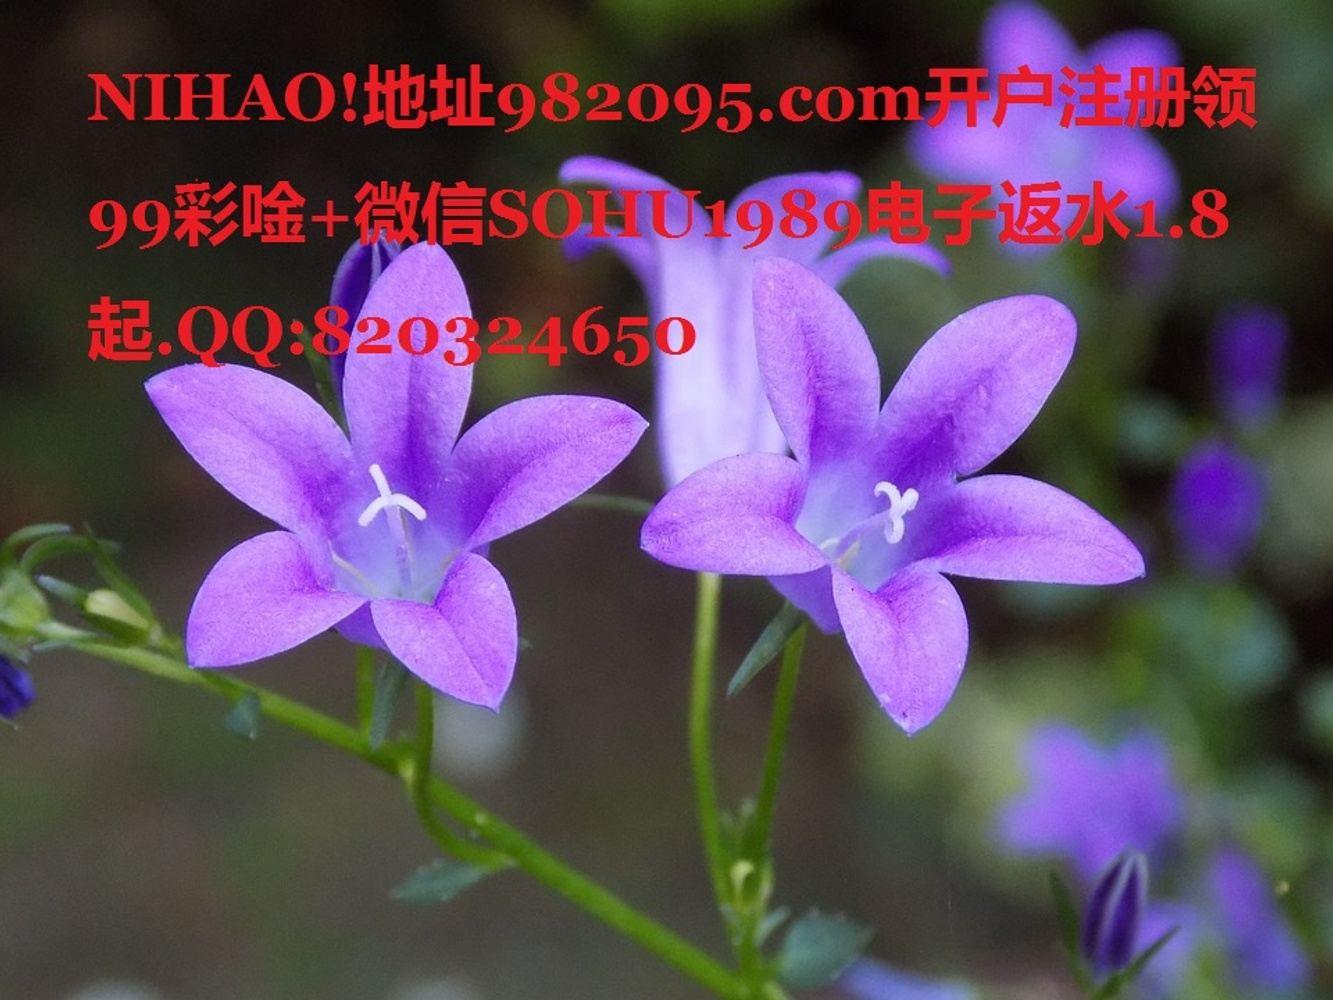 NIHAO!地址982095.com开户注册领99彩唫+微信SOHU1989电子返水1.8起.QQ:820324650